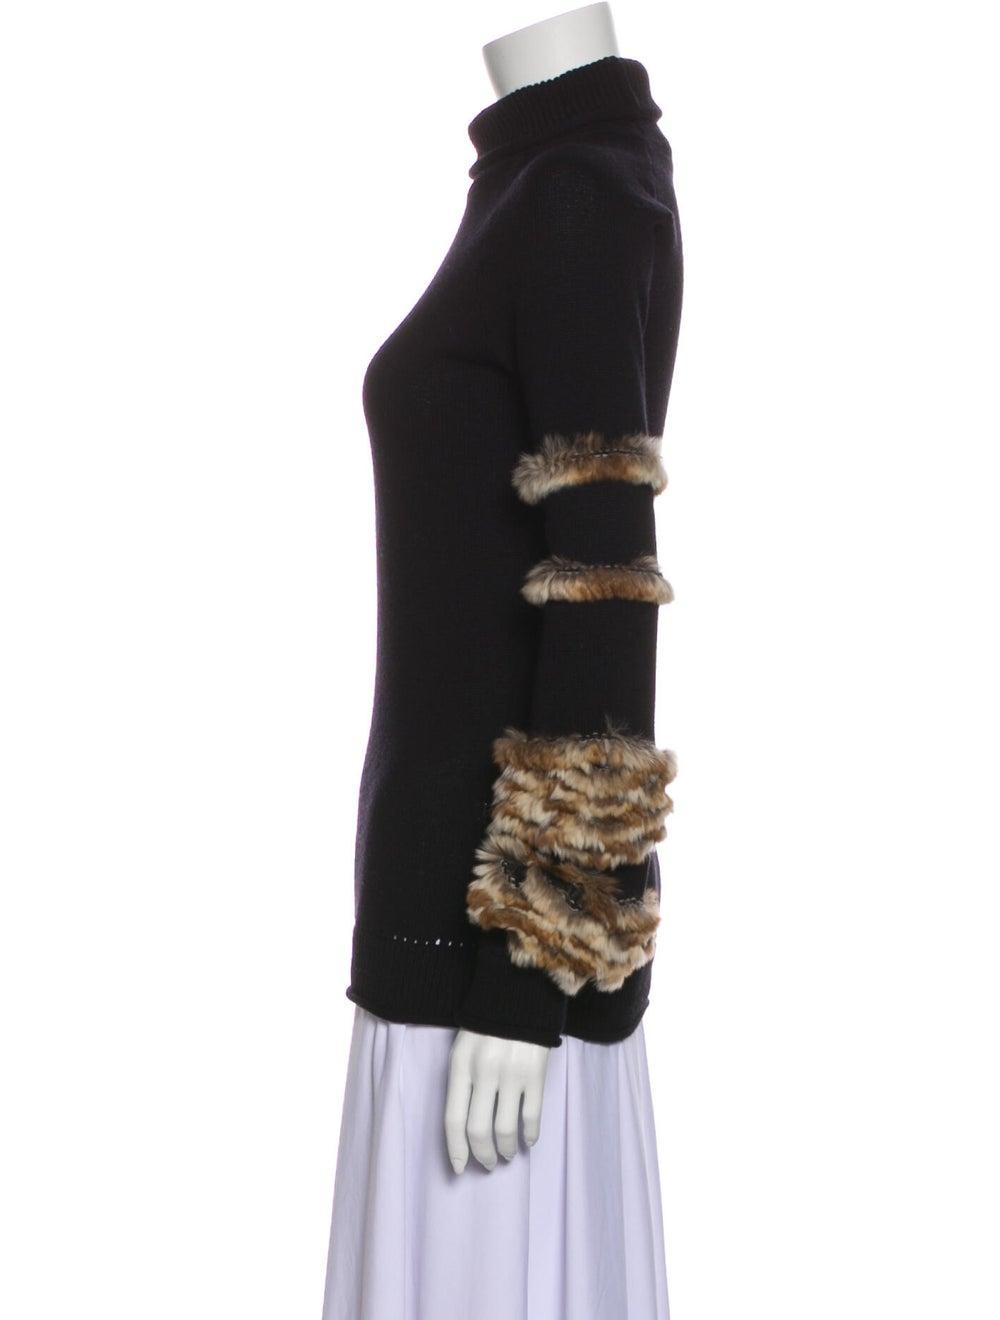 Fendi Cashmere Turtleneck Sweater Black - image 2